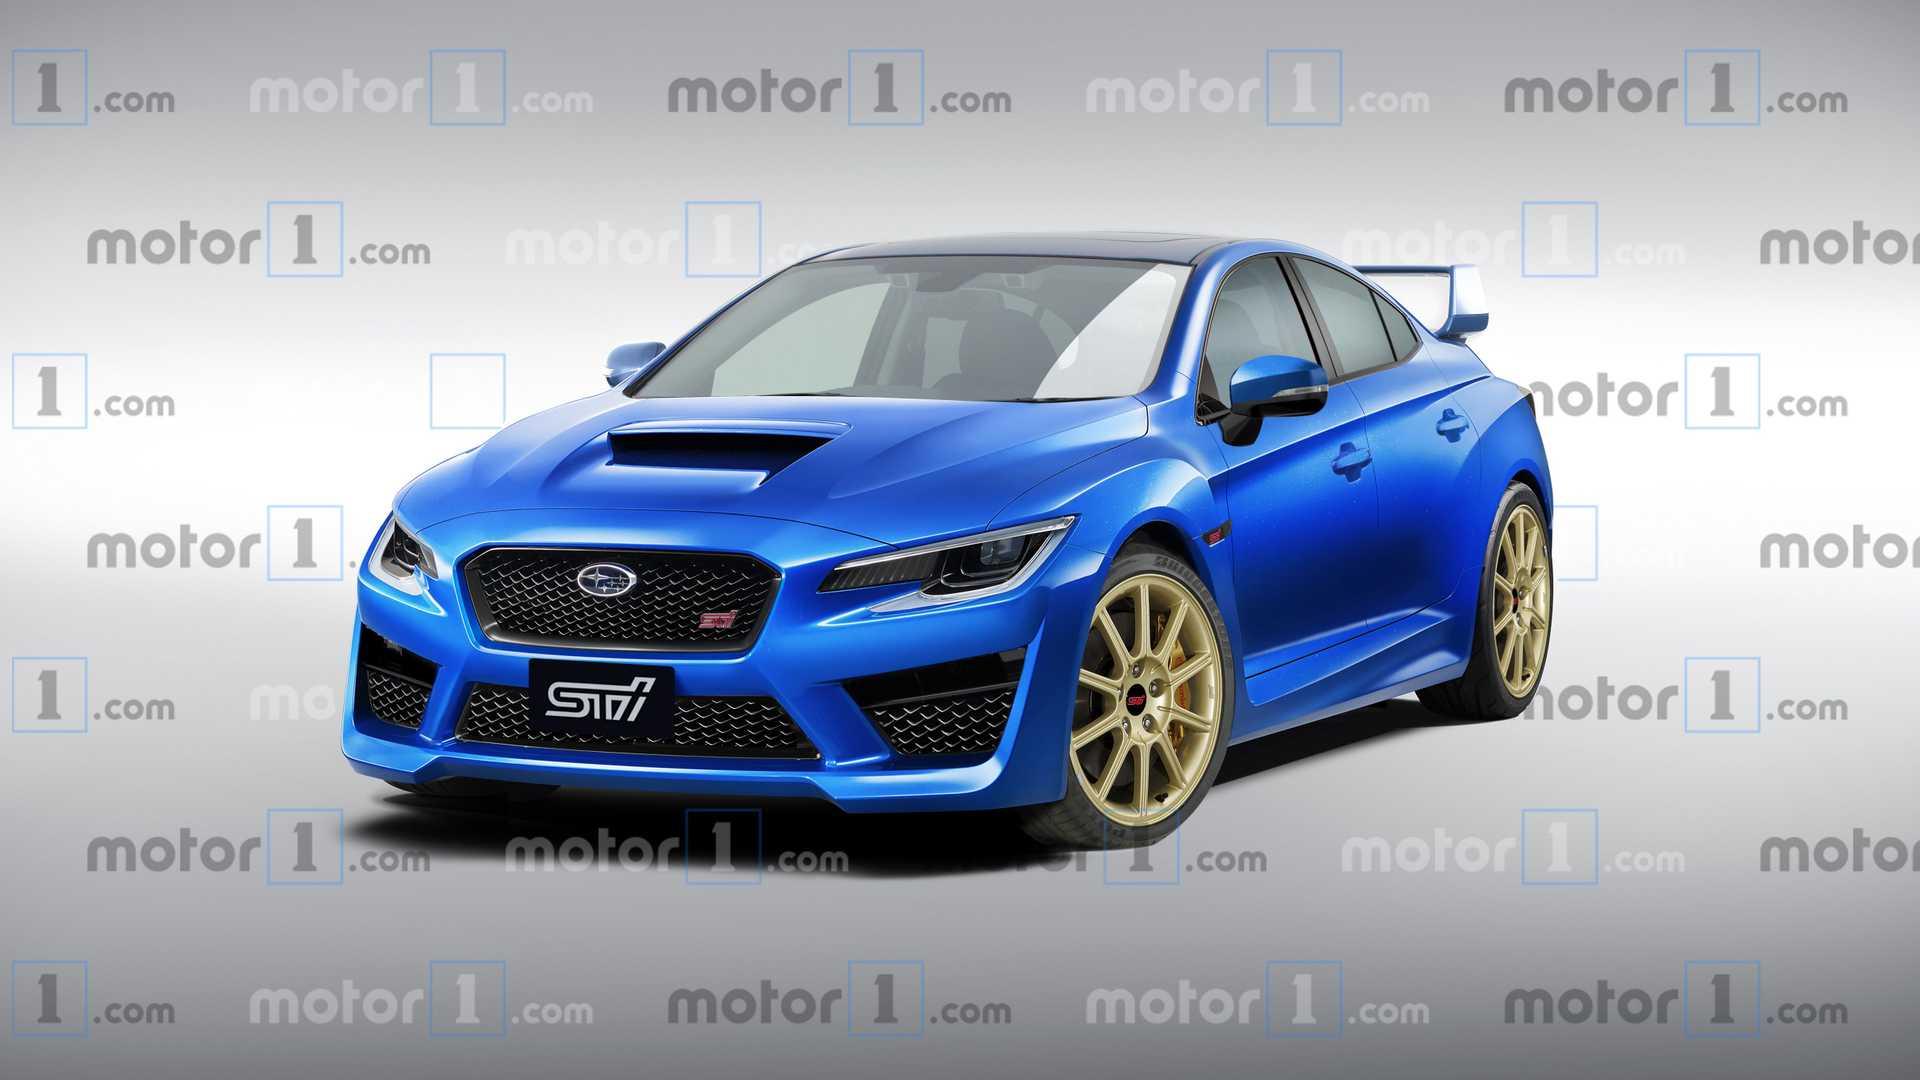 84 New Subaru Impreza Hybrid 2020 Prices by Subaru Impreza Hybrid 2020